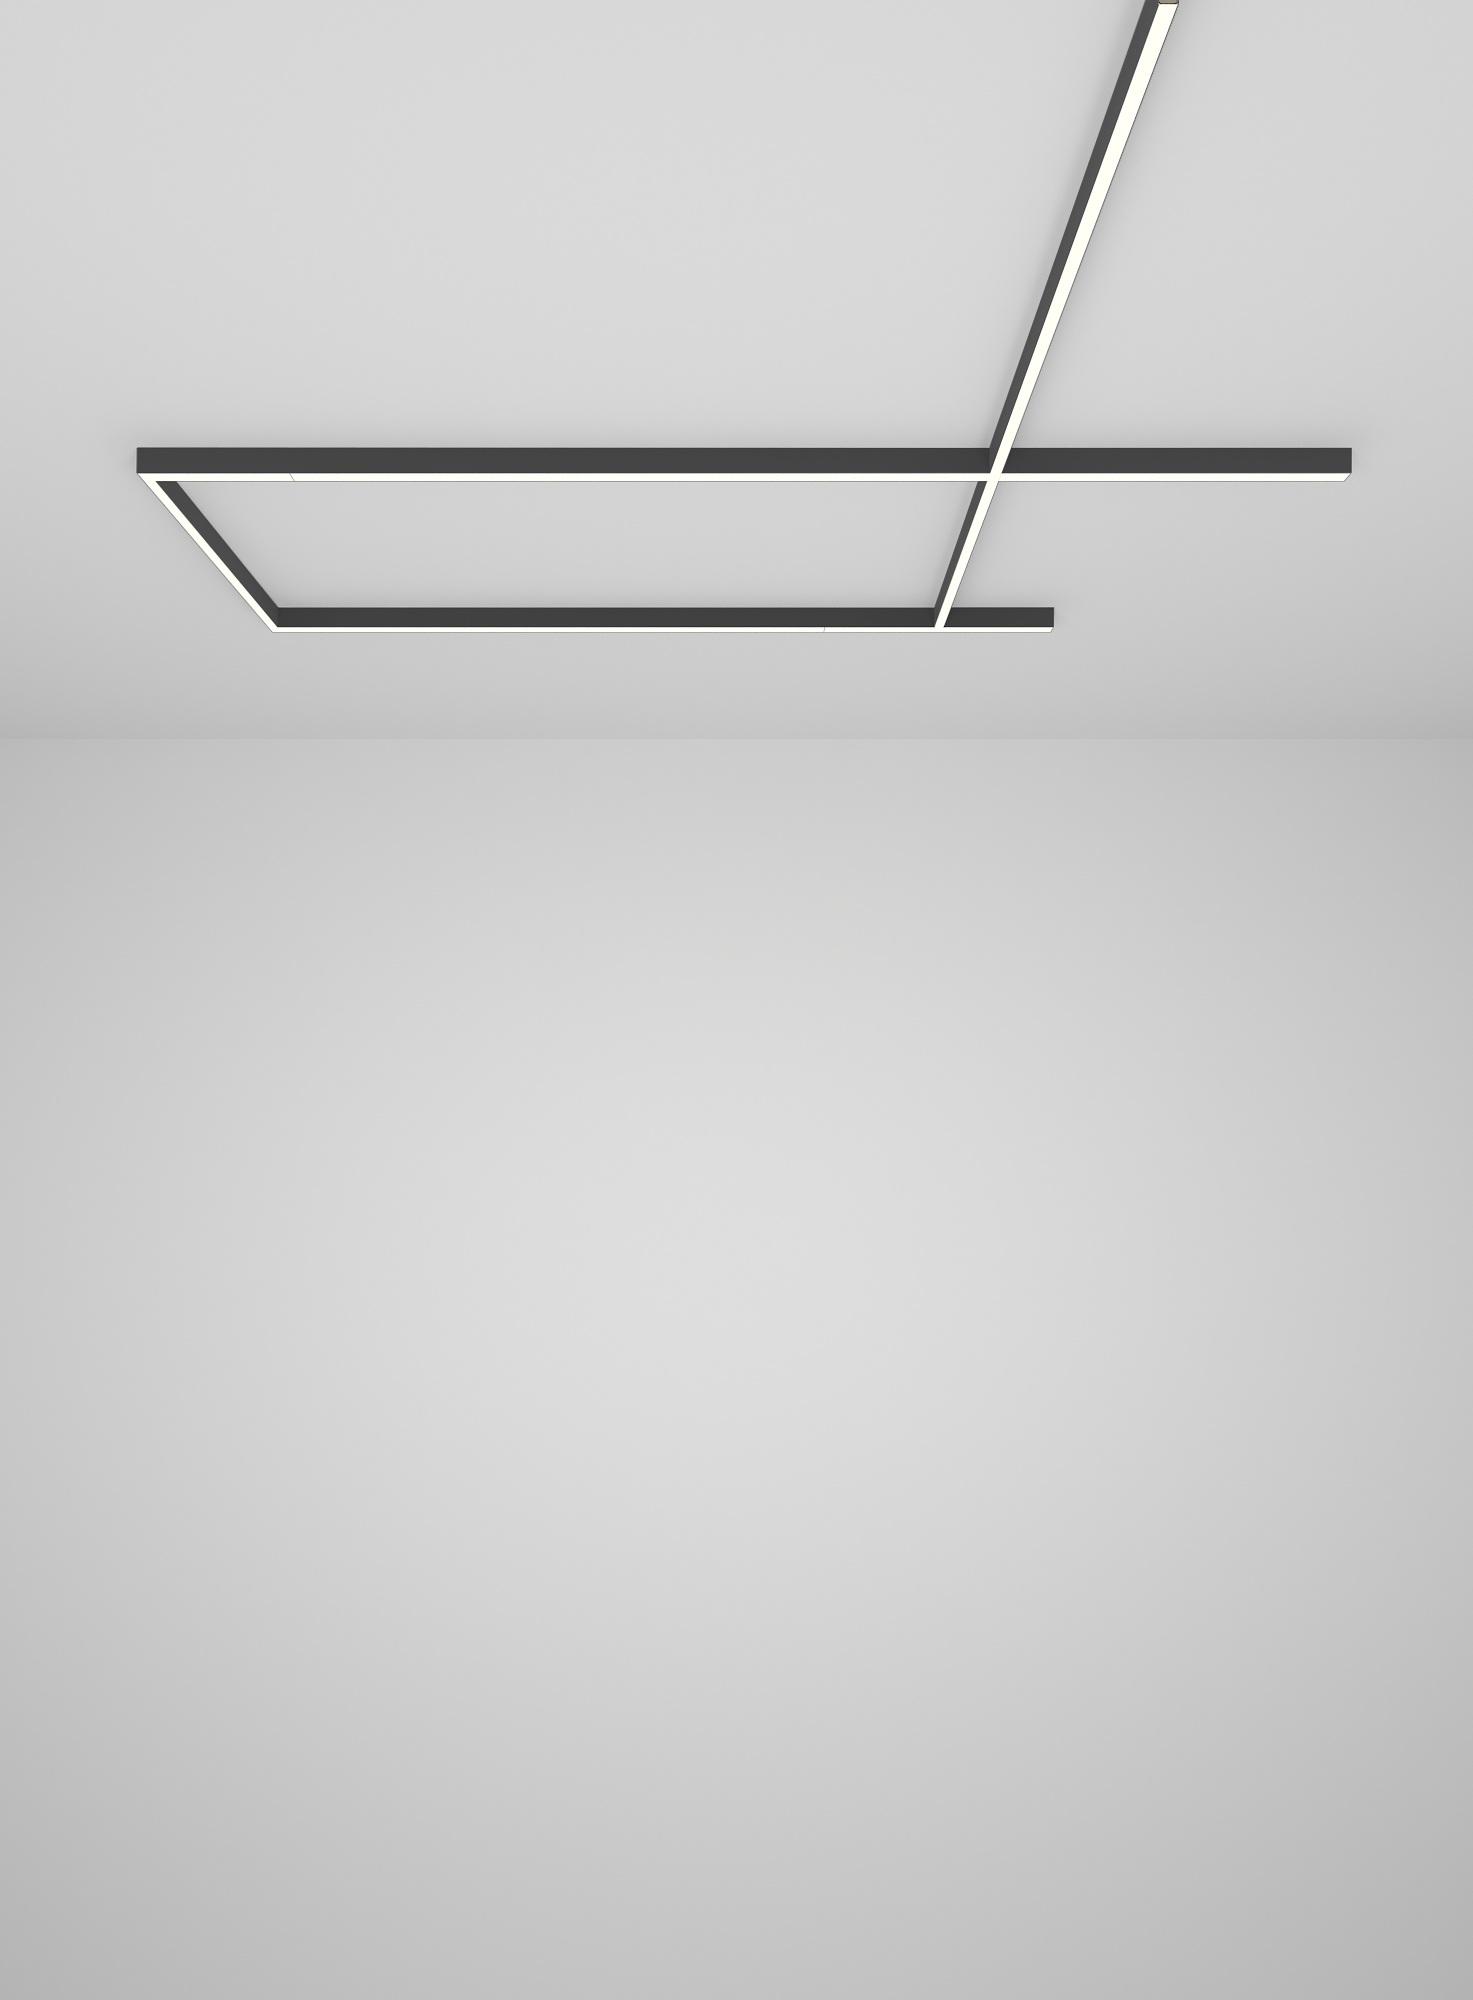 Catalogo+Vega+Surface.jpg